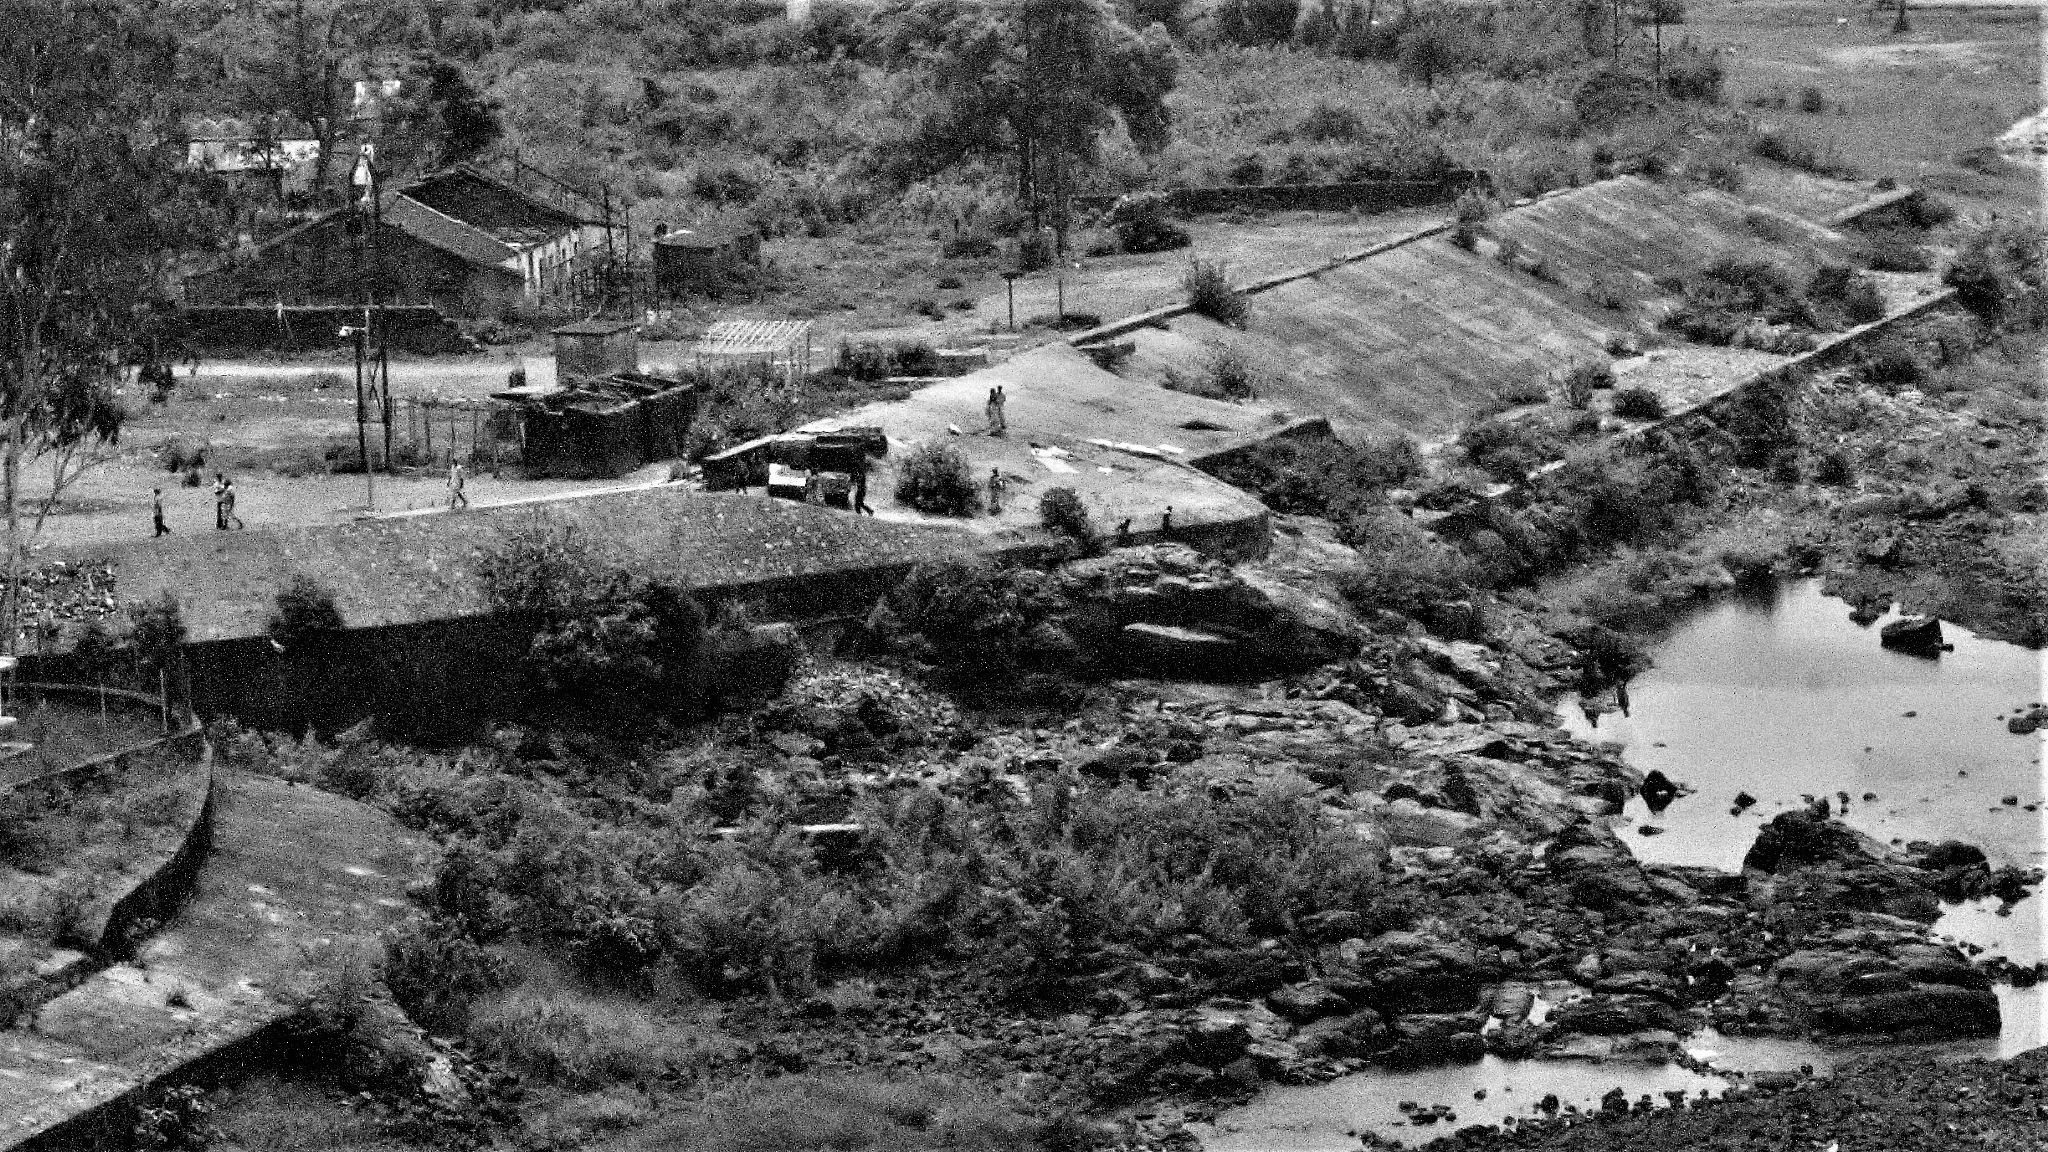 Under the Dam by Siddharth Sanyal